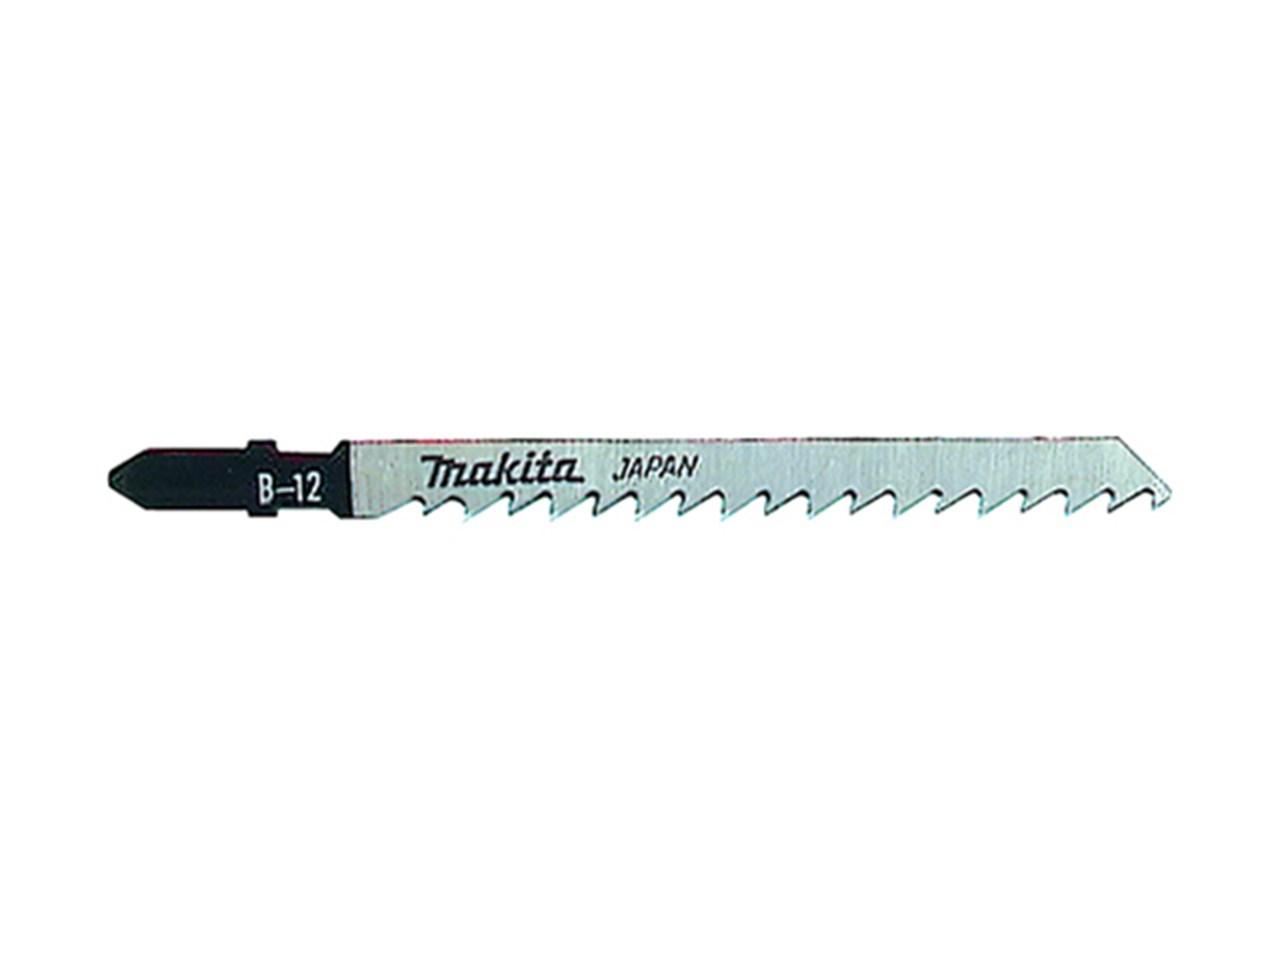 Makita B12 5pc Wood Jig Saw Blade Set